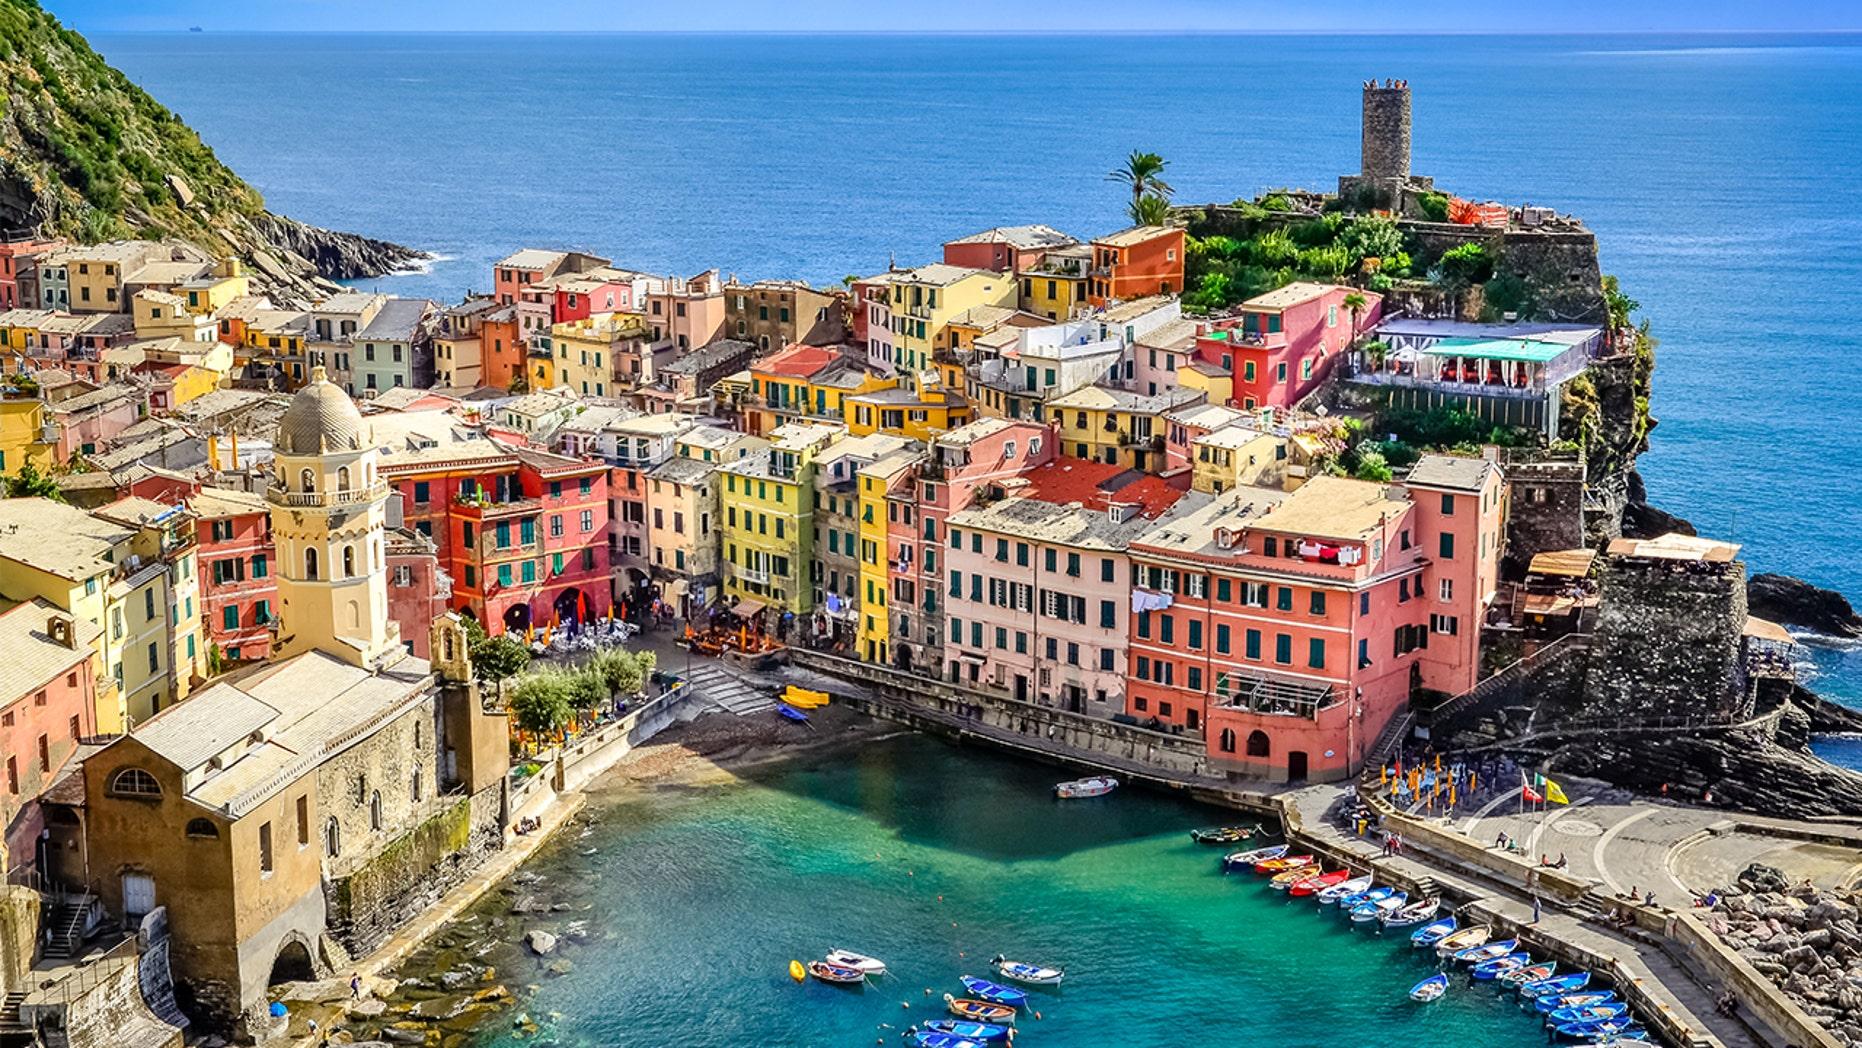 Scenic view of ocean and harbor in village Vernazza, Cinque Terre, Italy